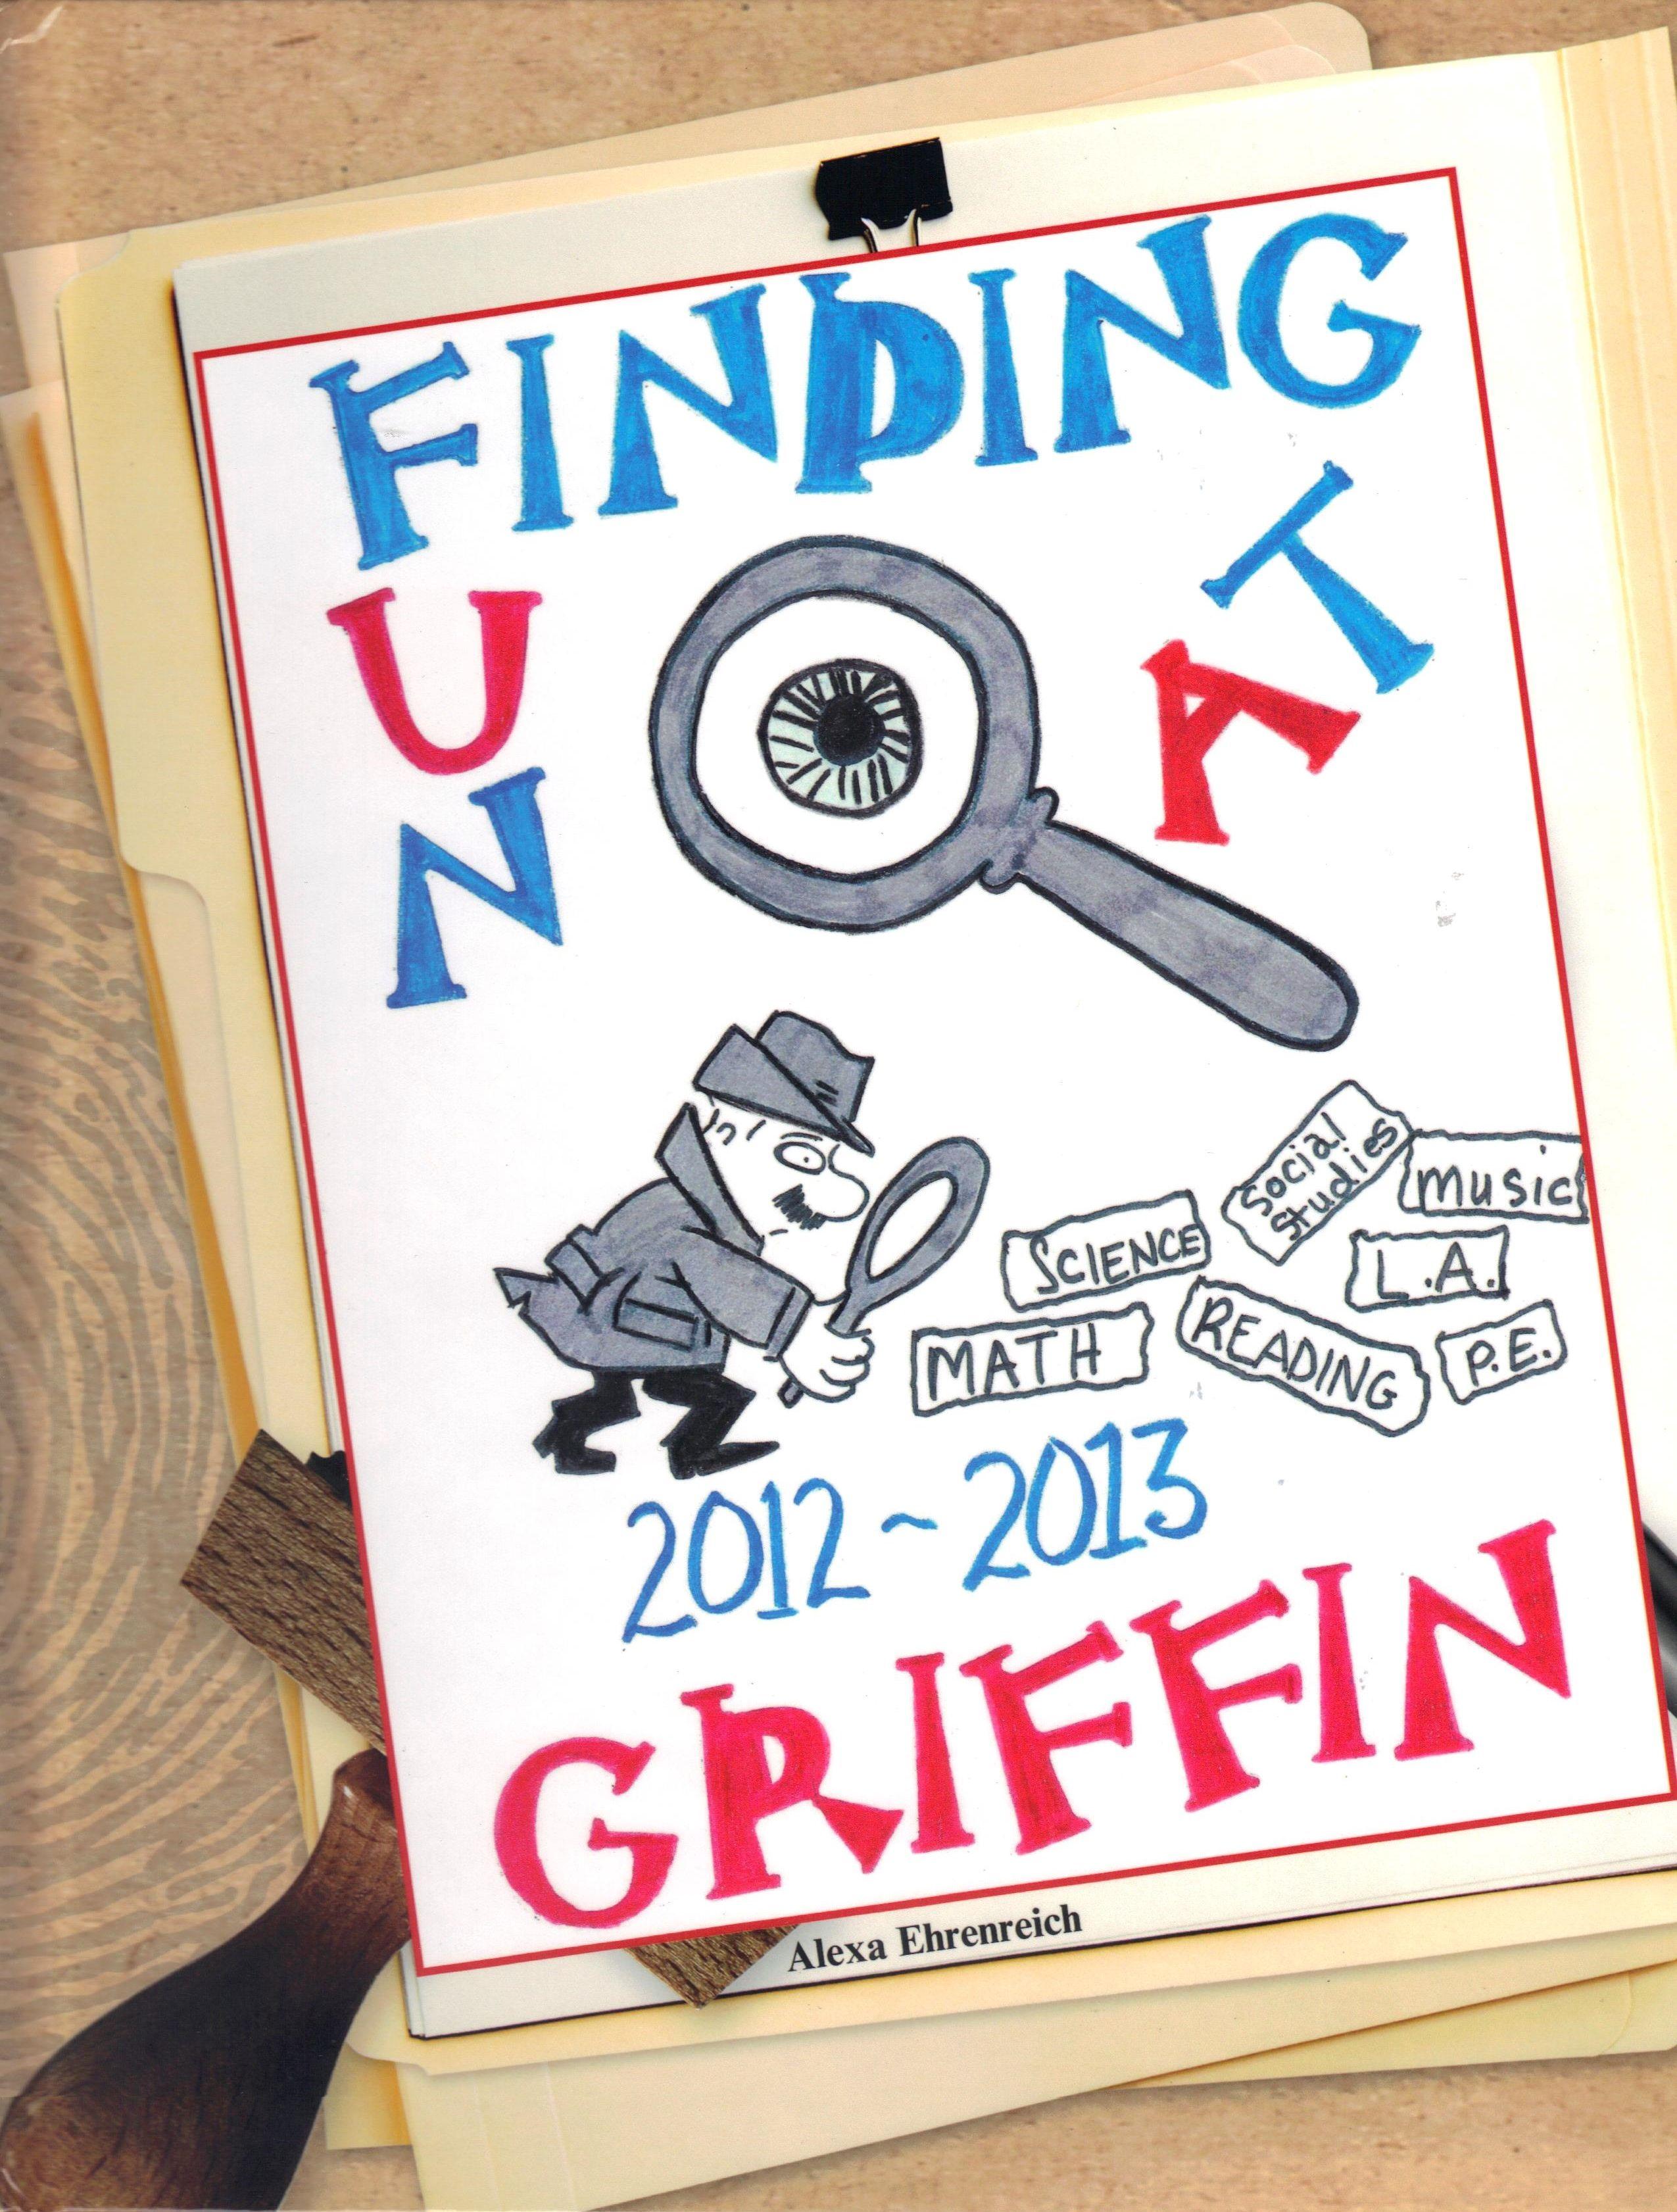 Elementary school scrapbook ideas - Griffin Elementary School Yearbook Cover